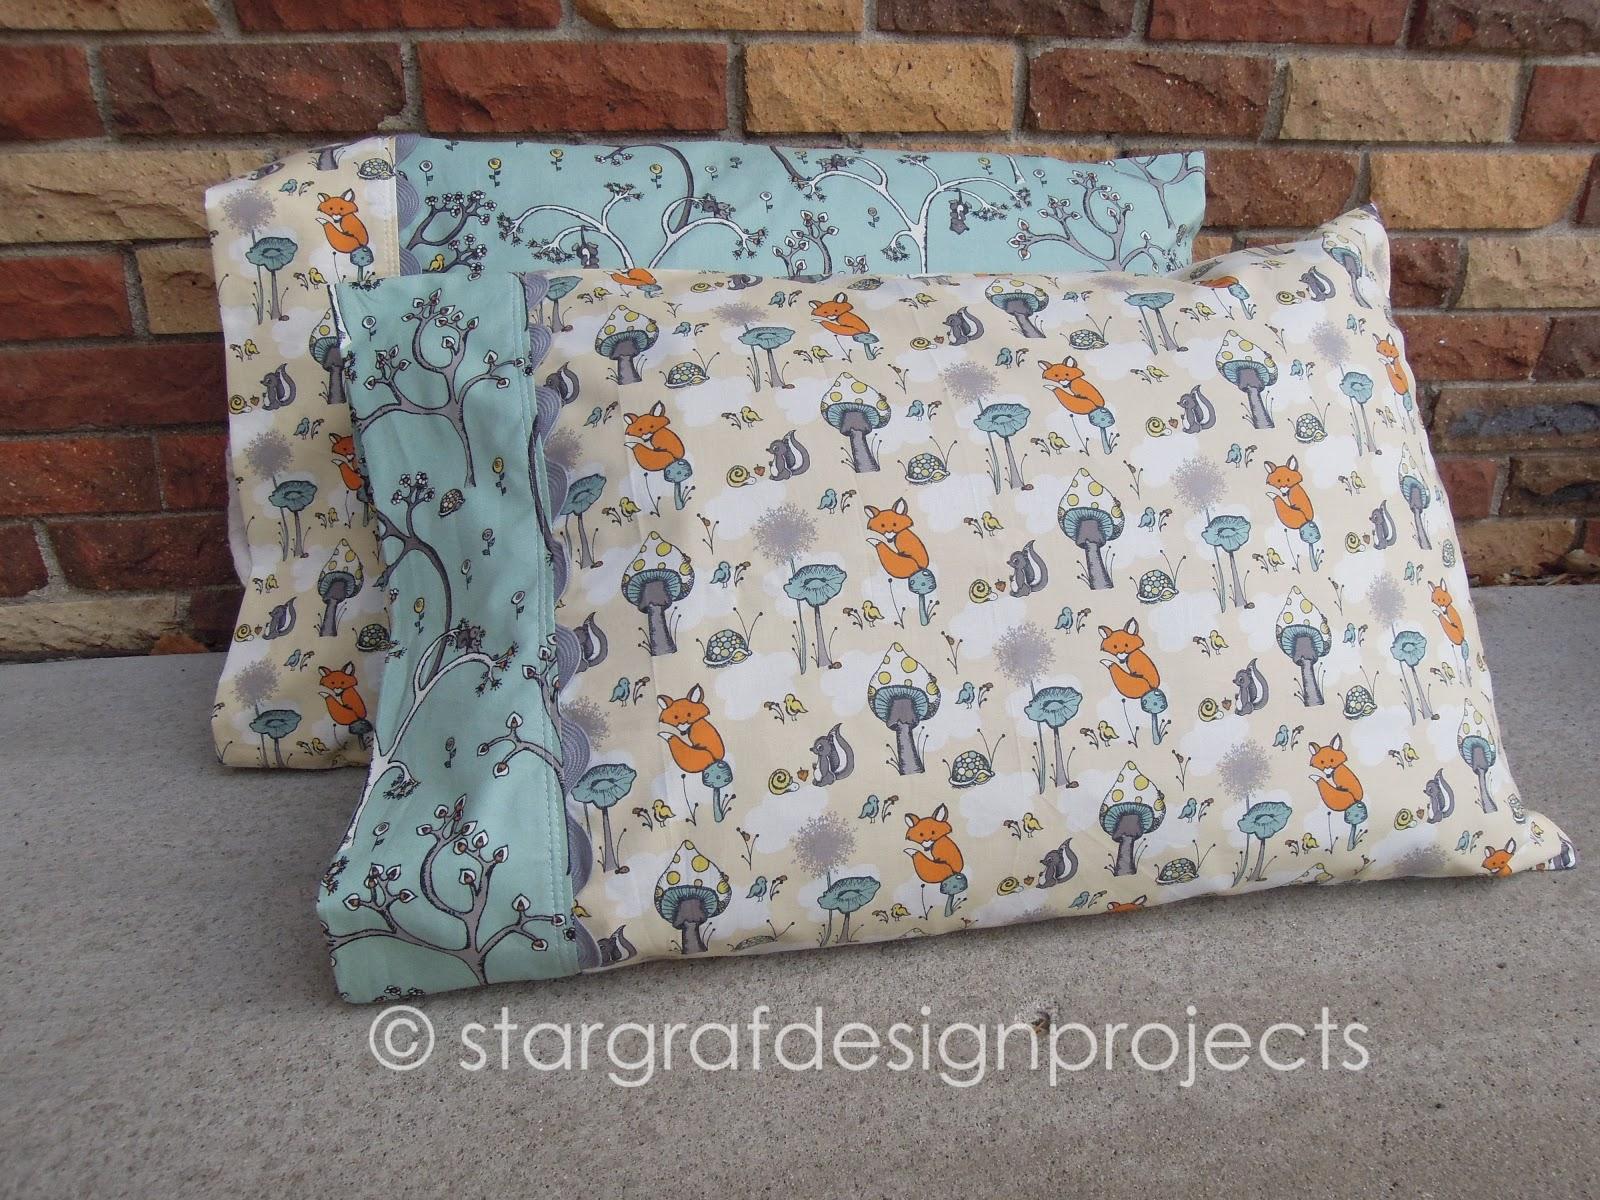 Fun Animal Print Pillow Cases